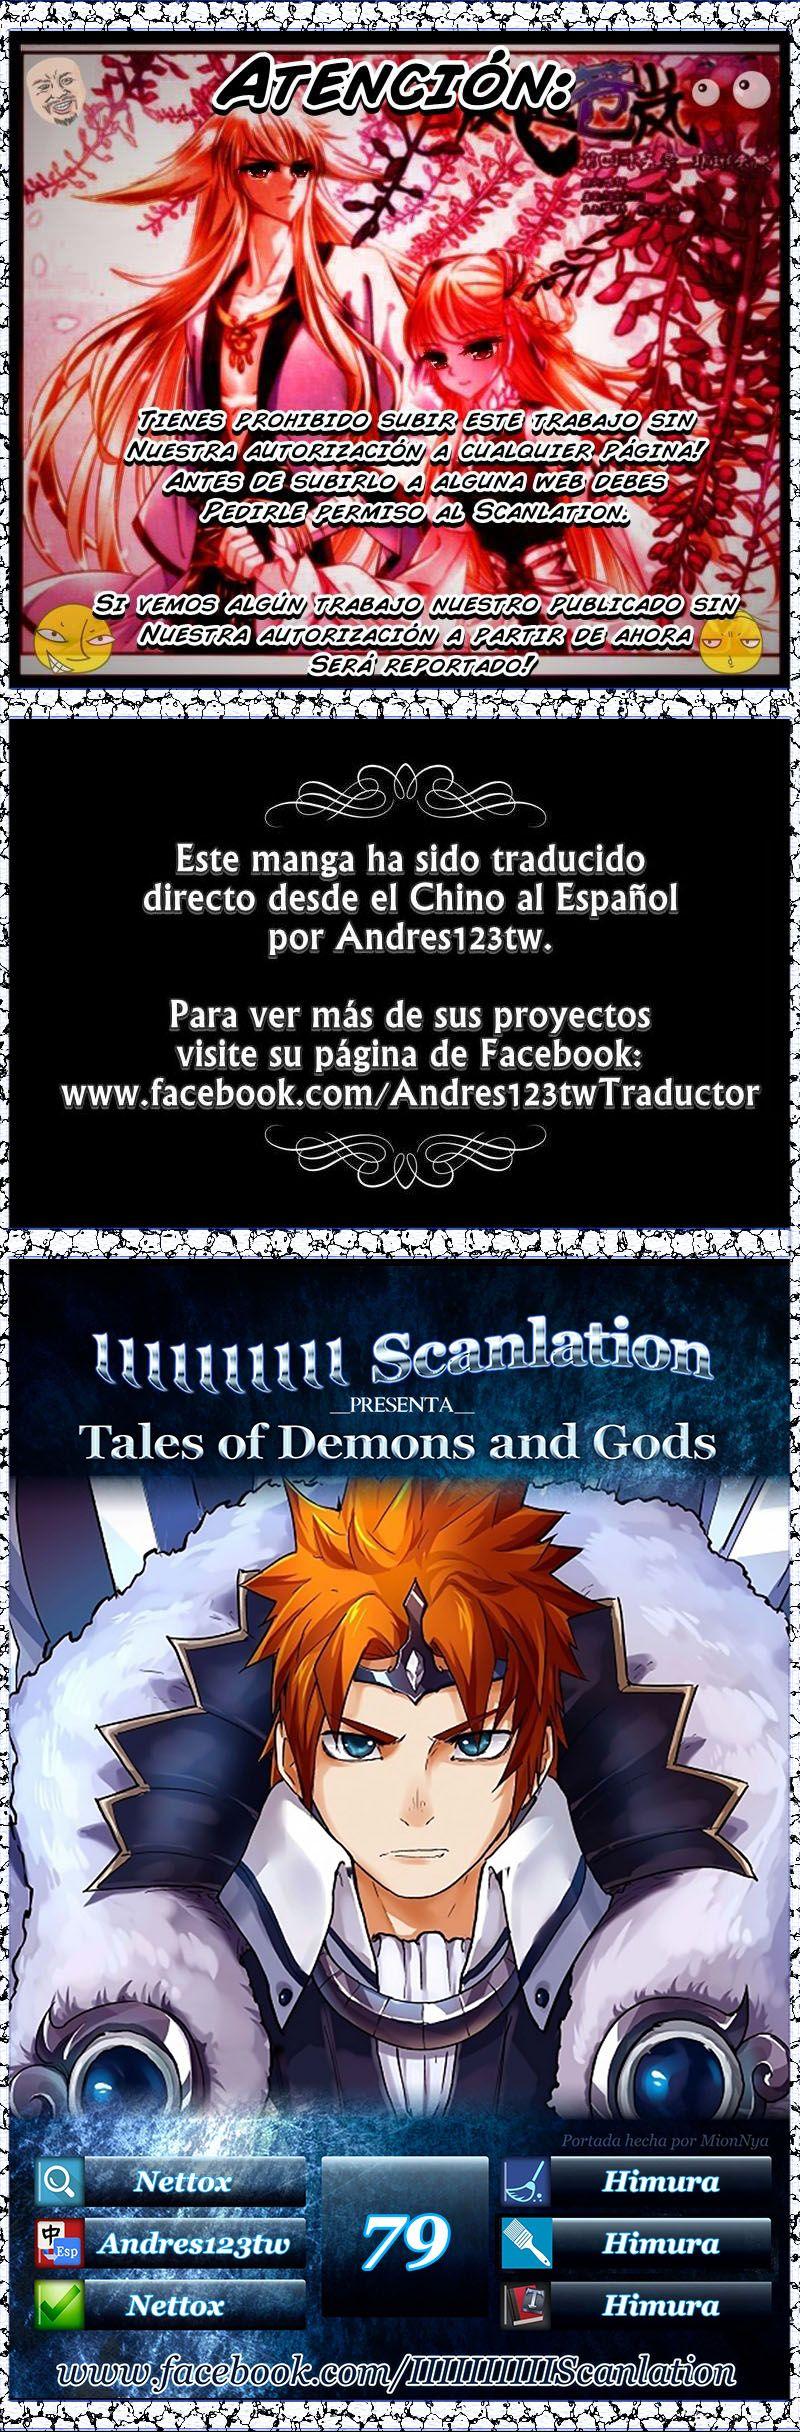 http://c5.ninemanga.com/es_manga/7/17735/461722/d41e0e6f6f1e29098d9d152511503ab2.jpg Page 1